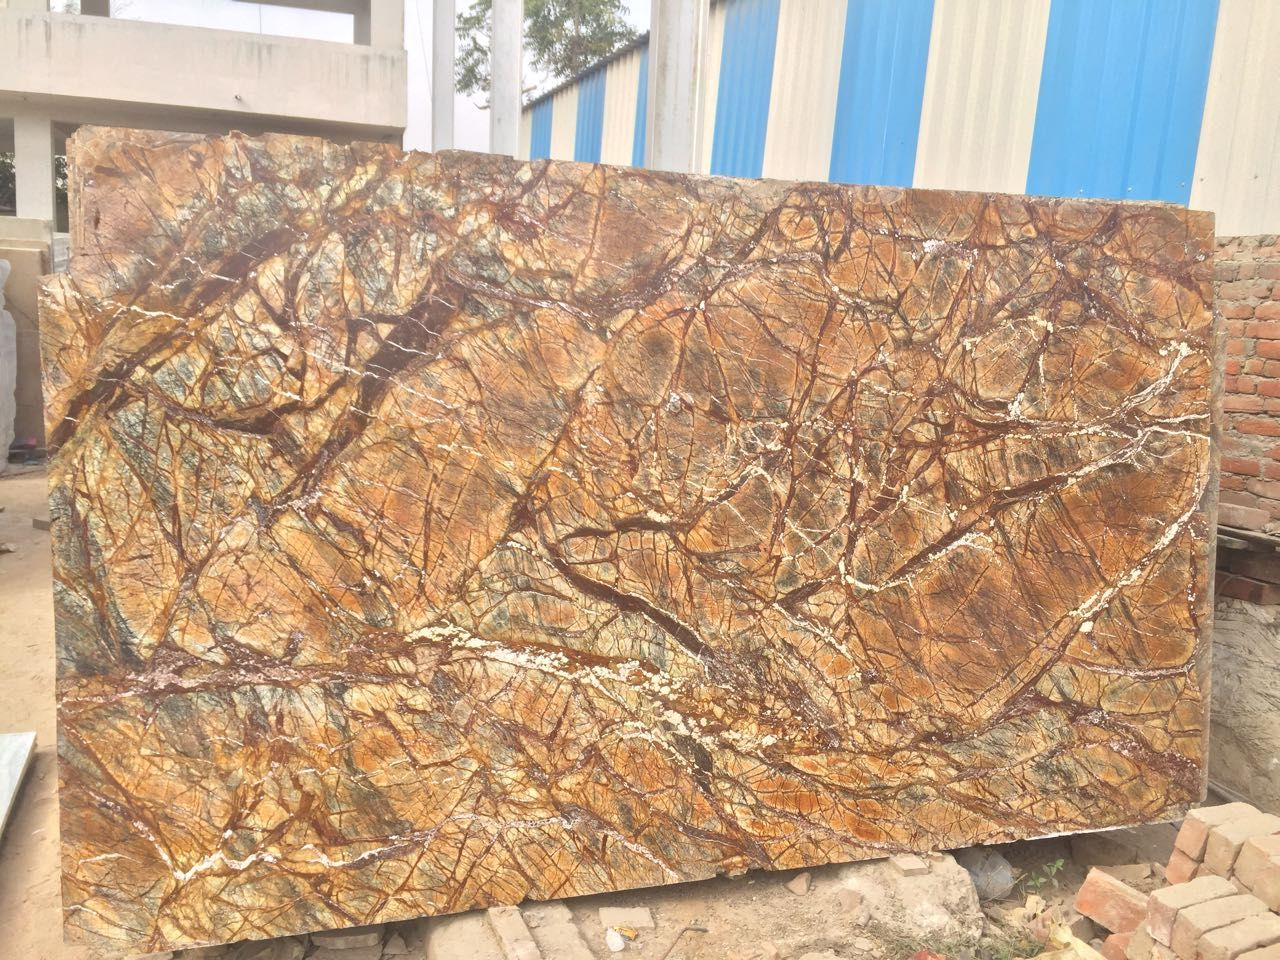 Best Rainforest Brown Marble Slabs Tiles Price Manufacturer India in 2021 |  Tiles price, Marble slab, Brown countertop